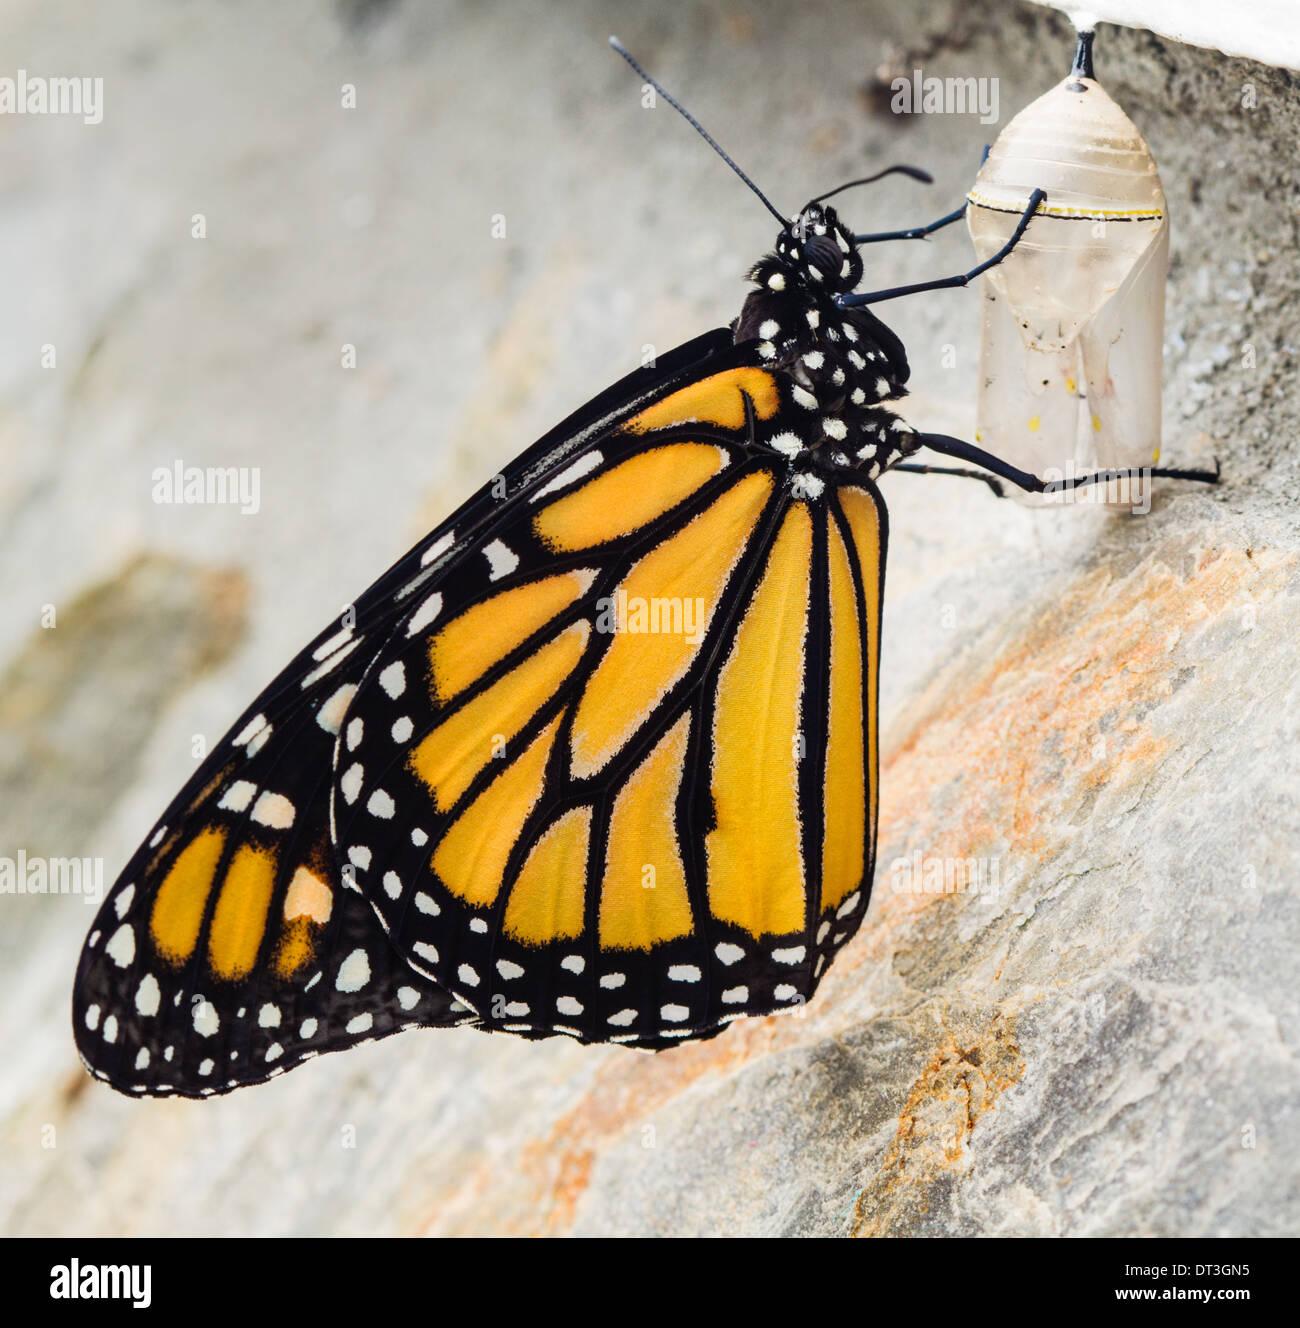 Monarch Butterfly (Danaus plexippus) just emerged from its chrysalis. - Stock Image